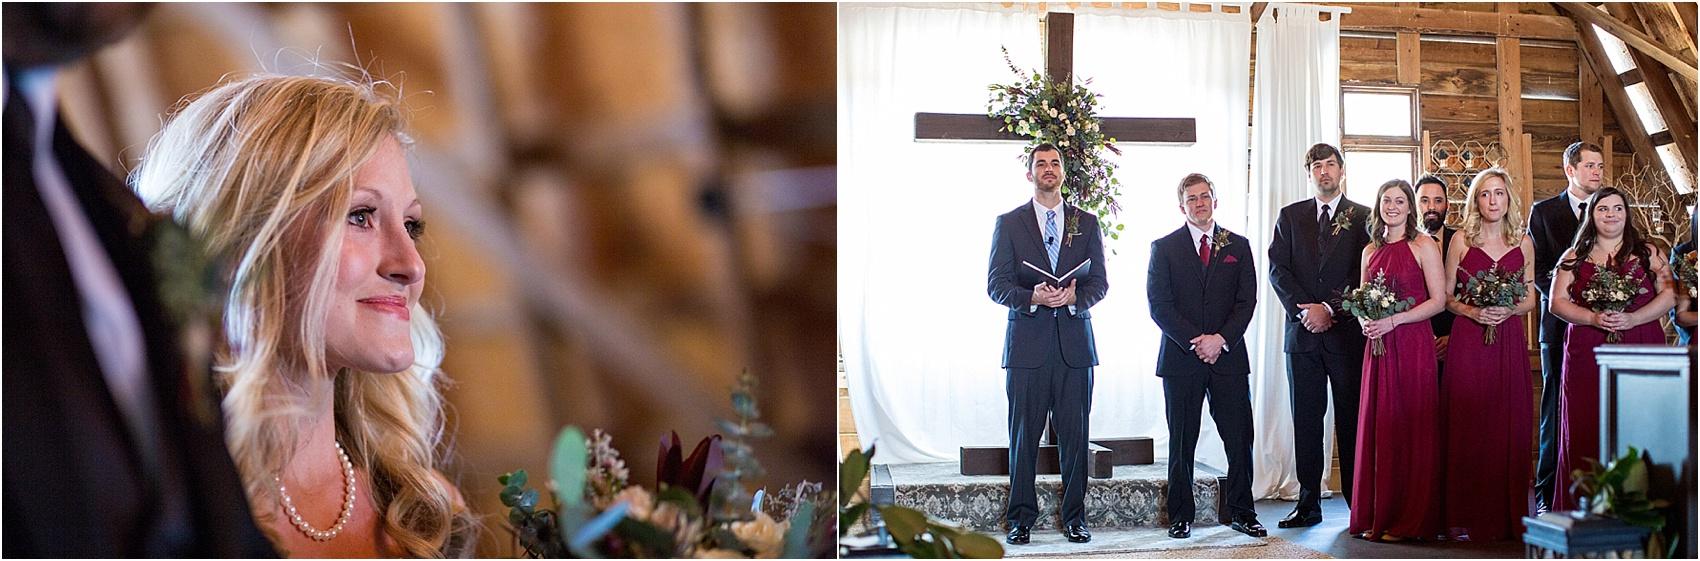 Bethune Wedding- Highlights-63.jpg